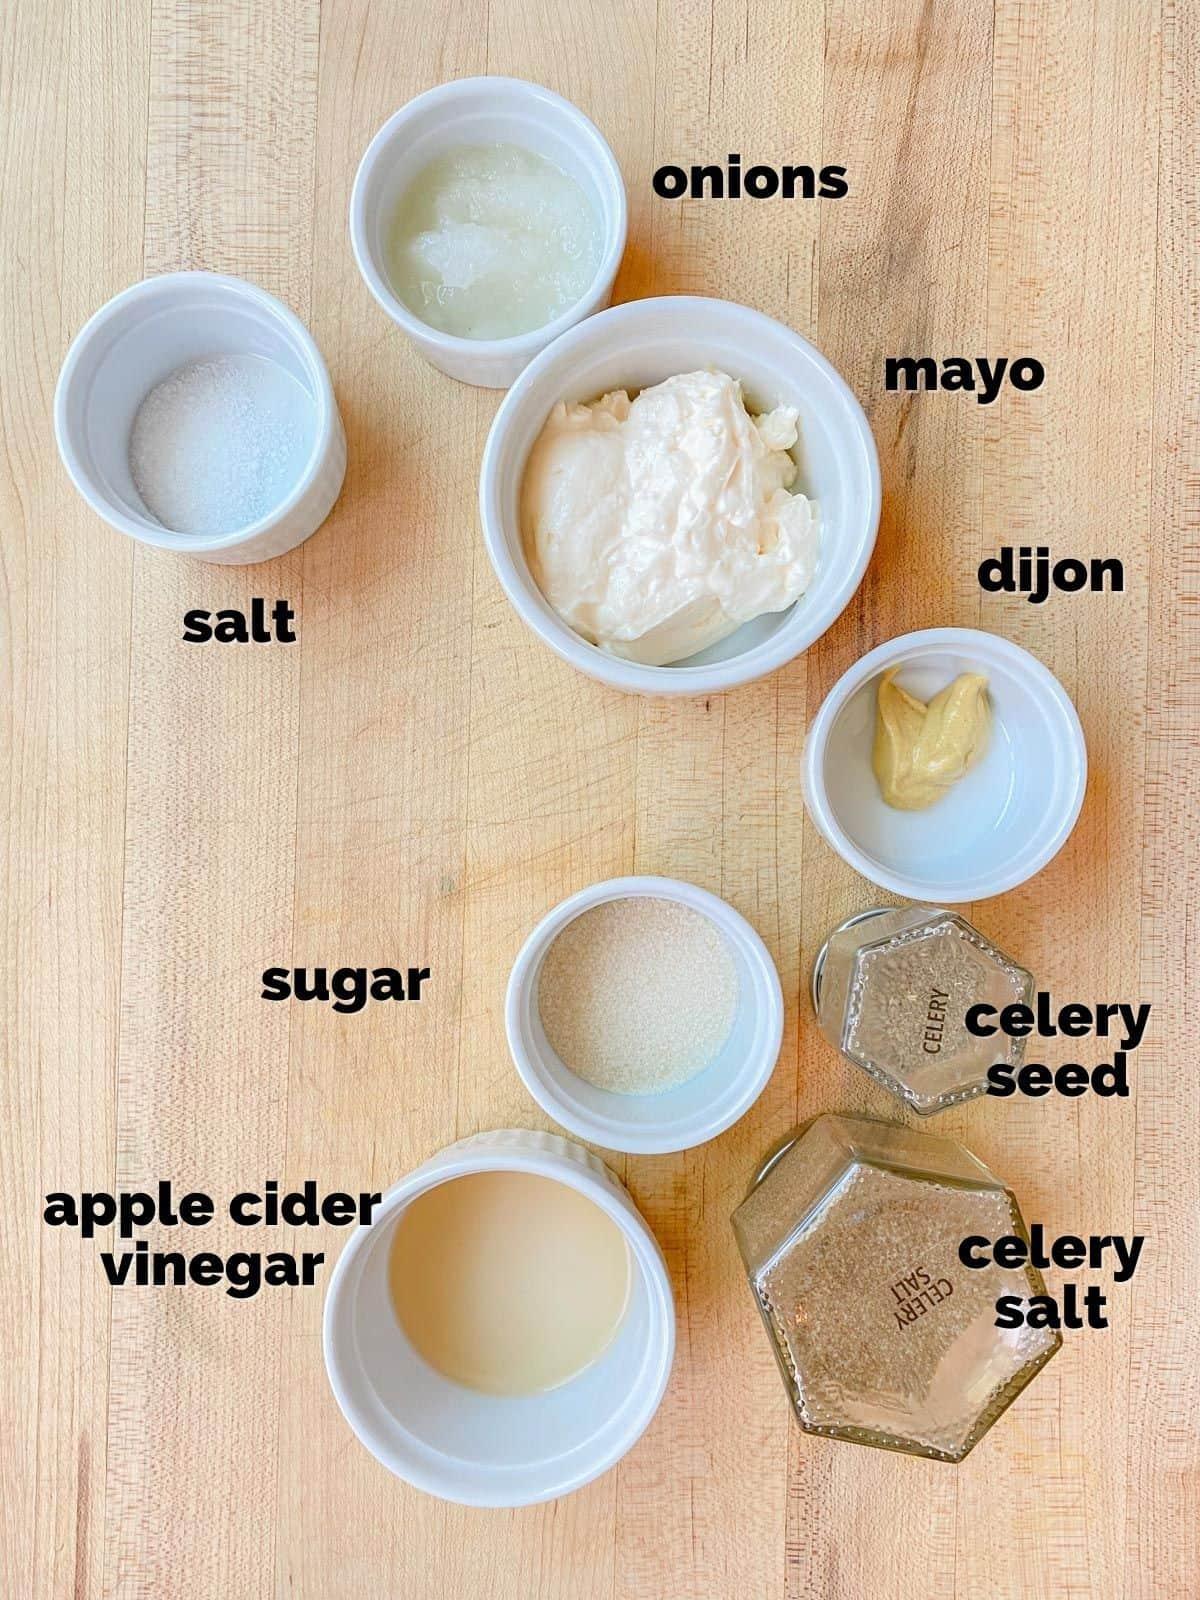 ingredients for coleslaw dressing